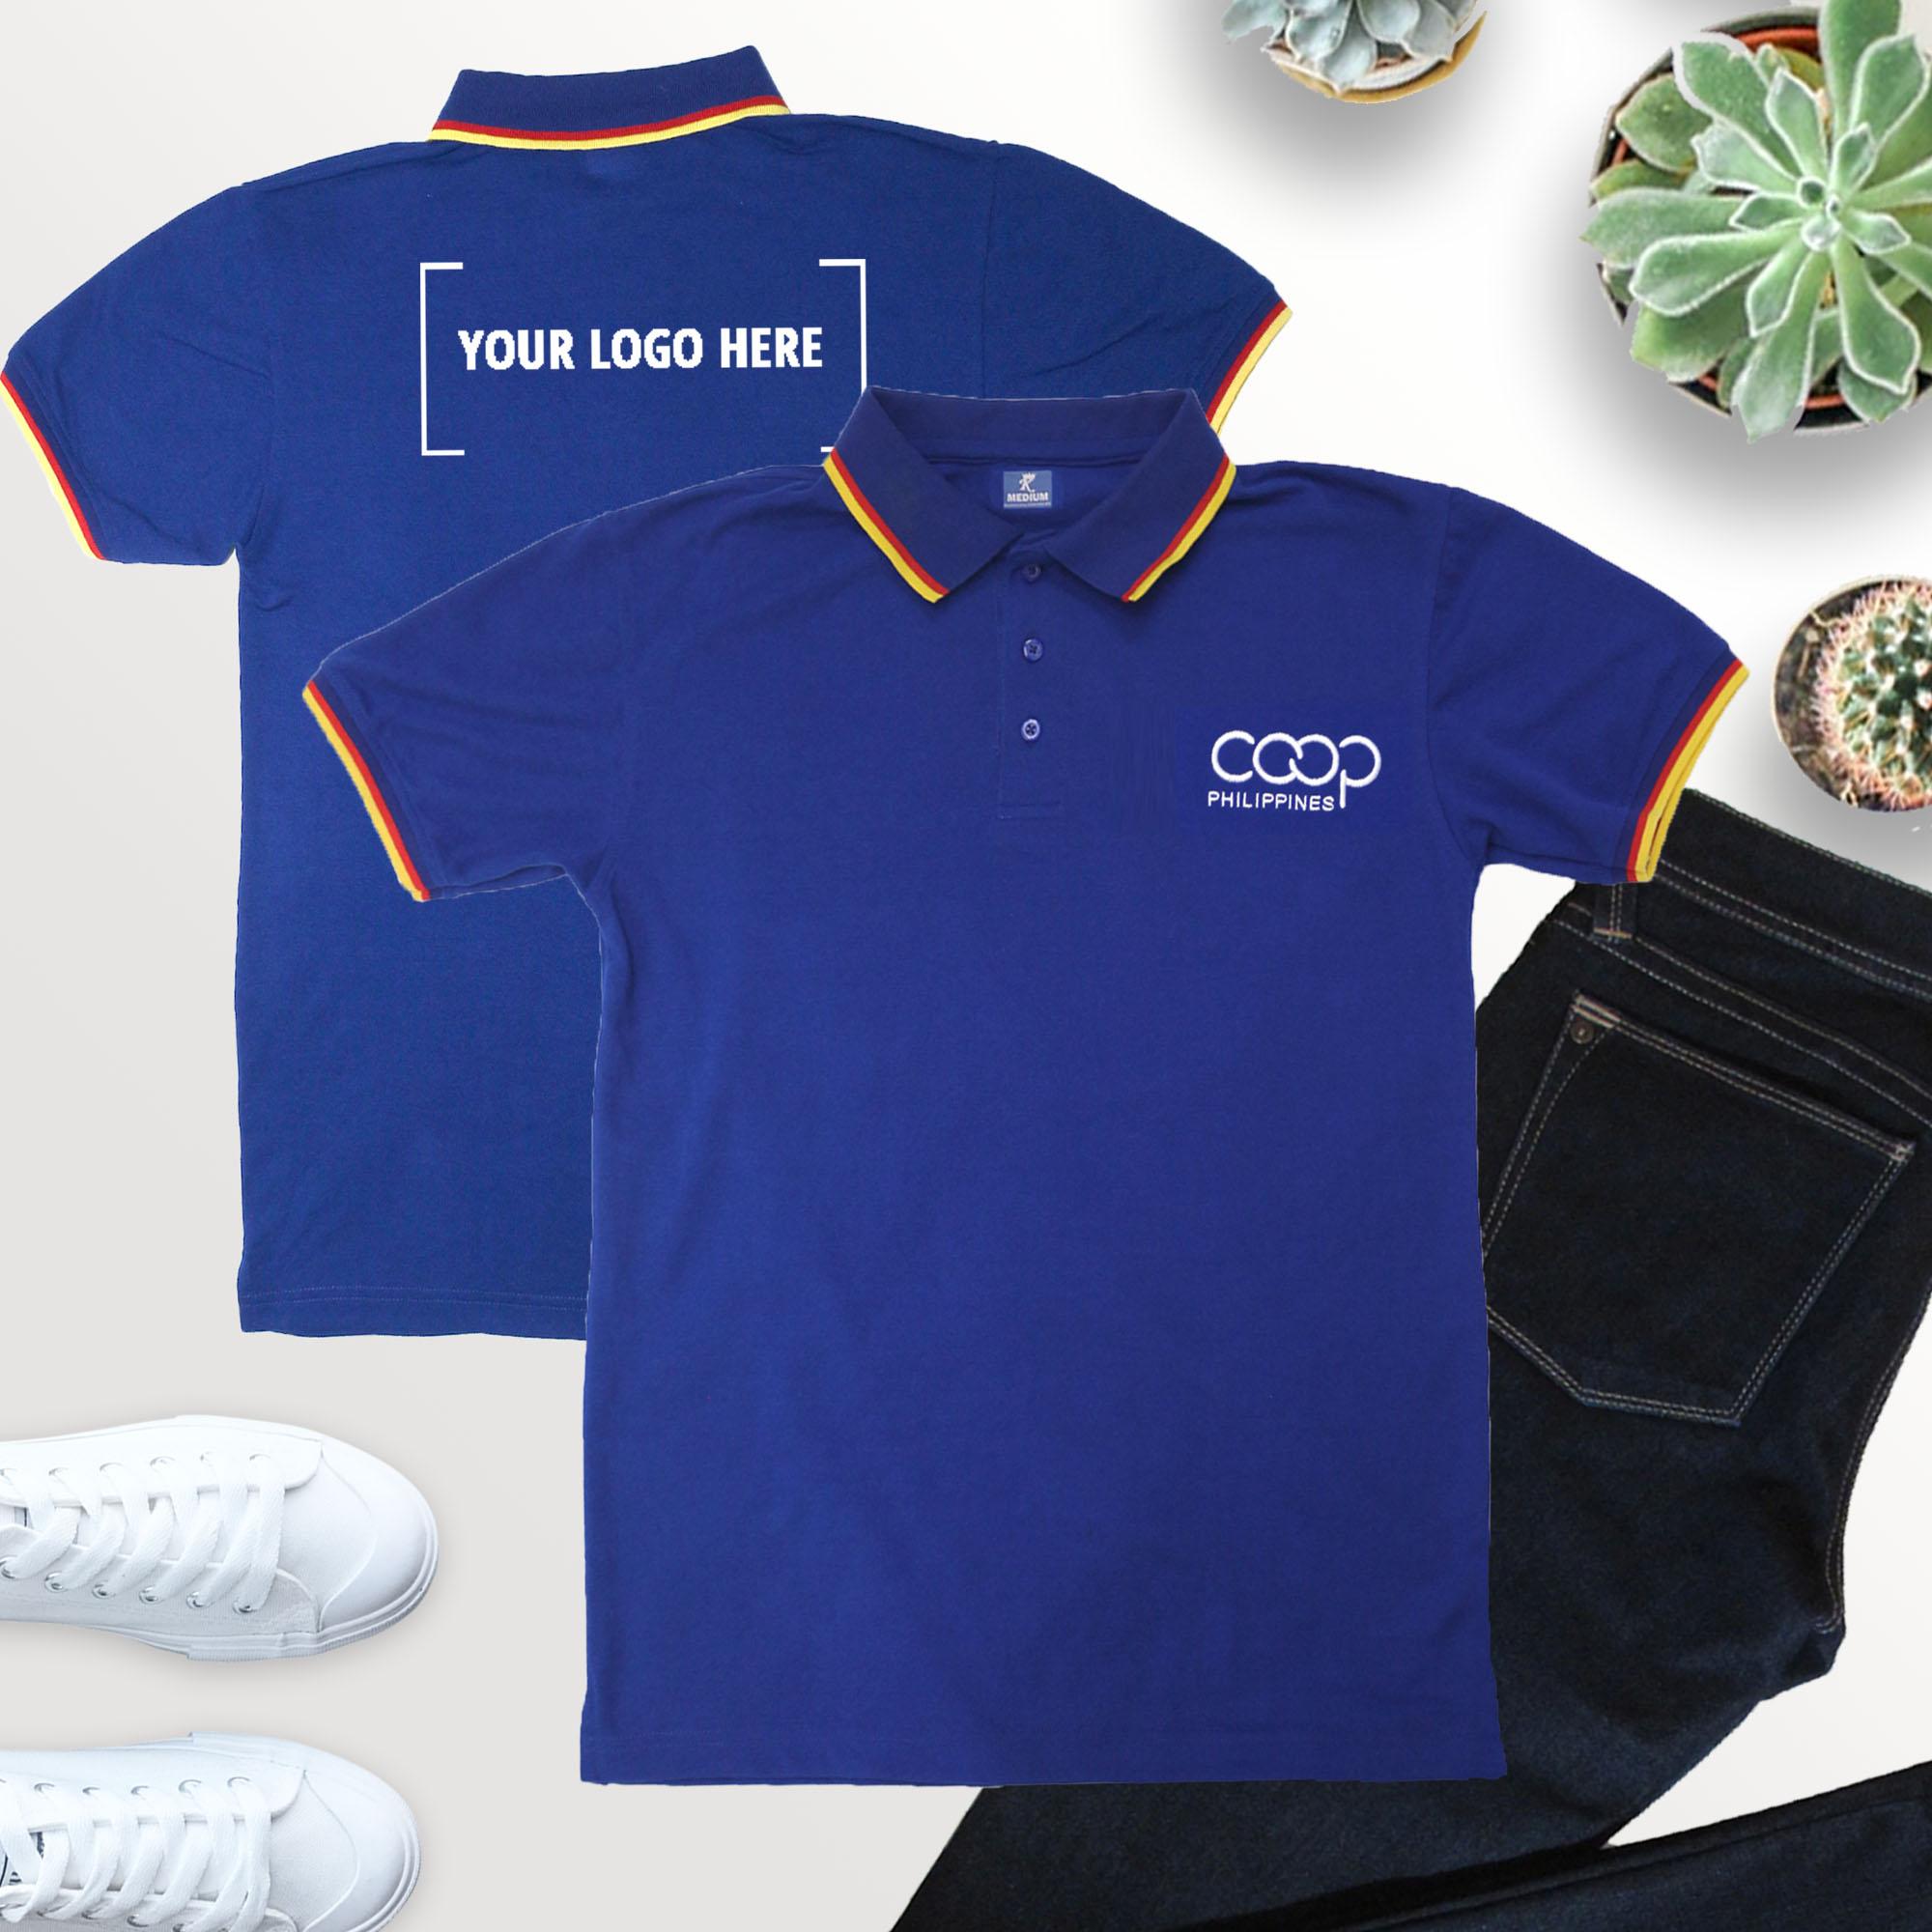 Clic Coop Philippines Uniform With